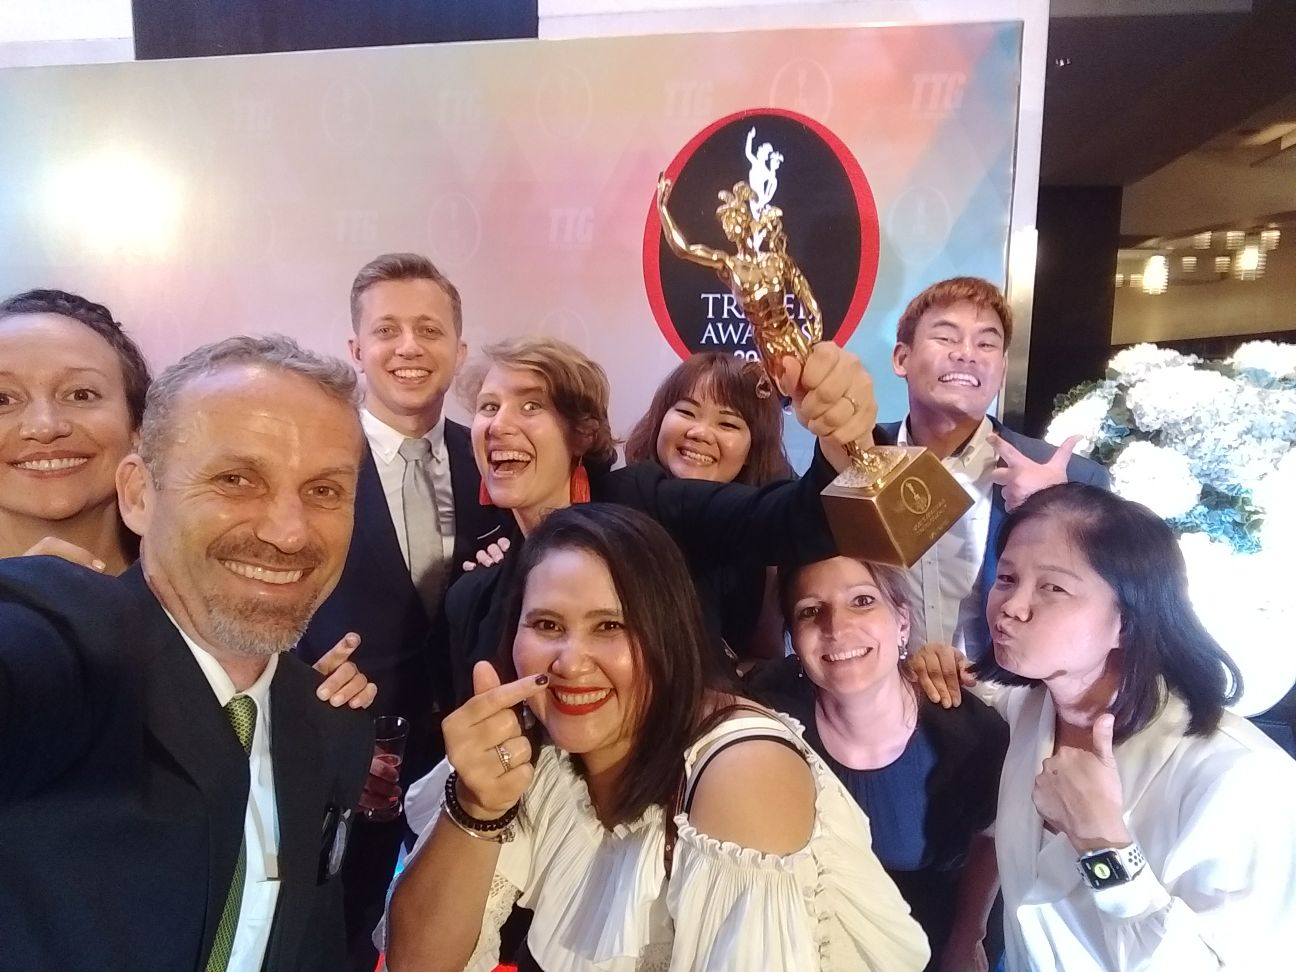 TTG Award